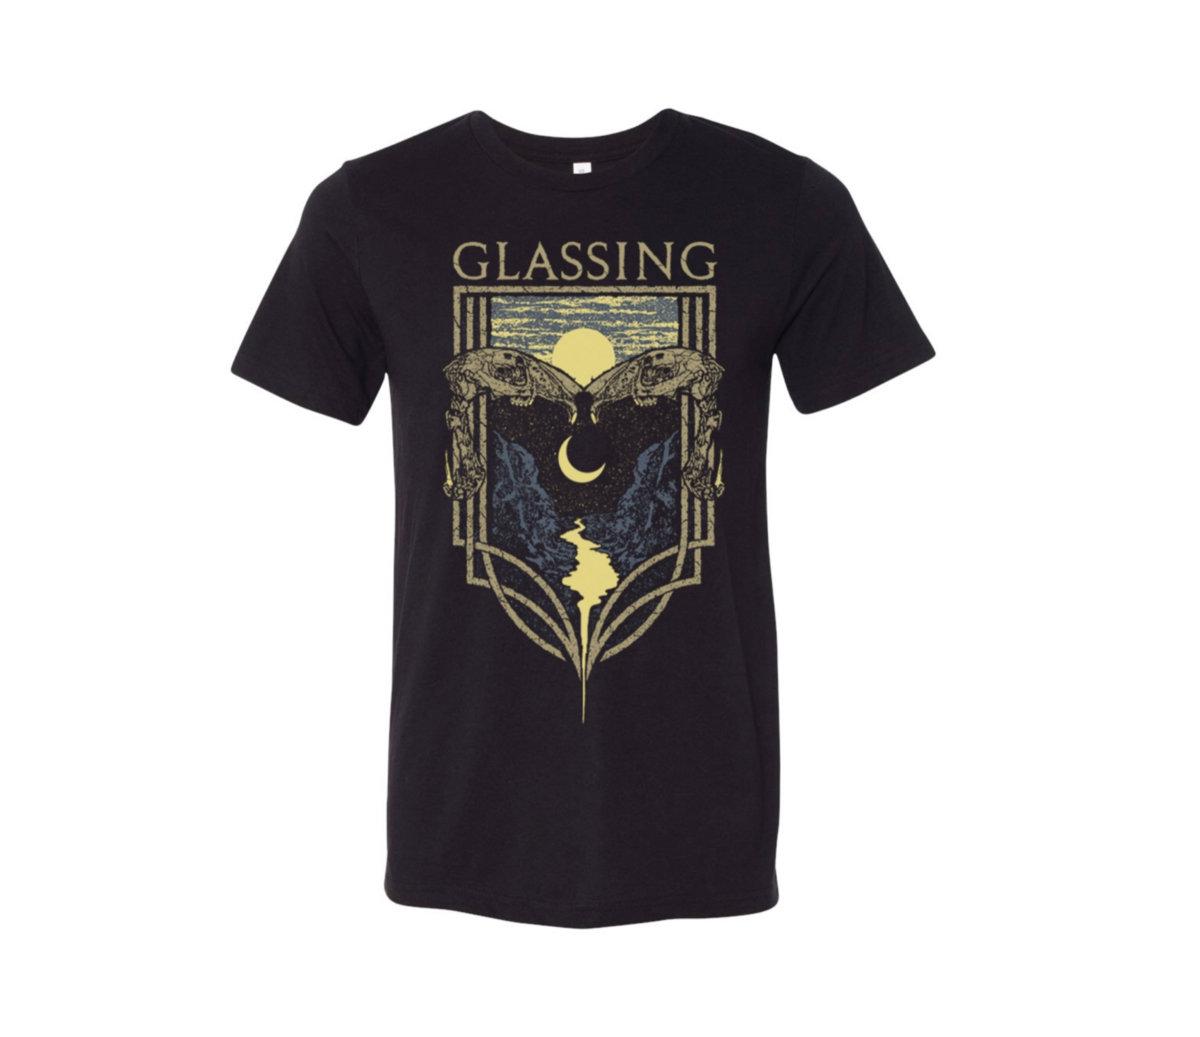 Glassing -